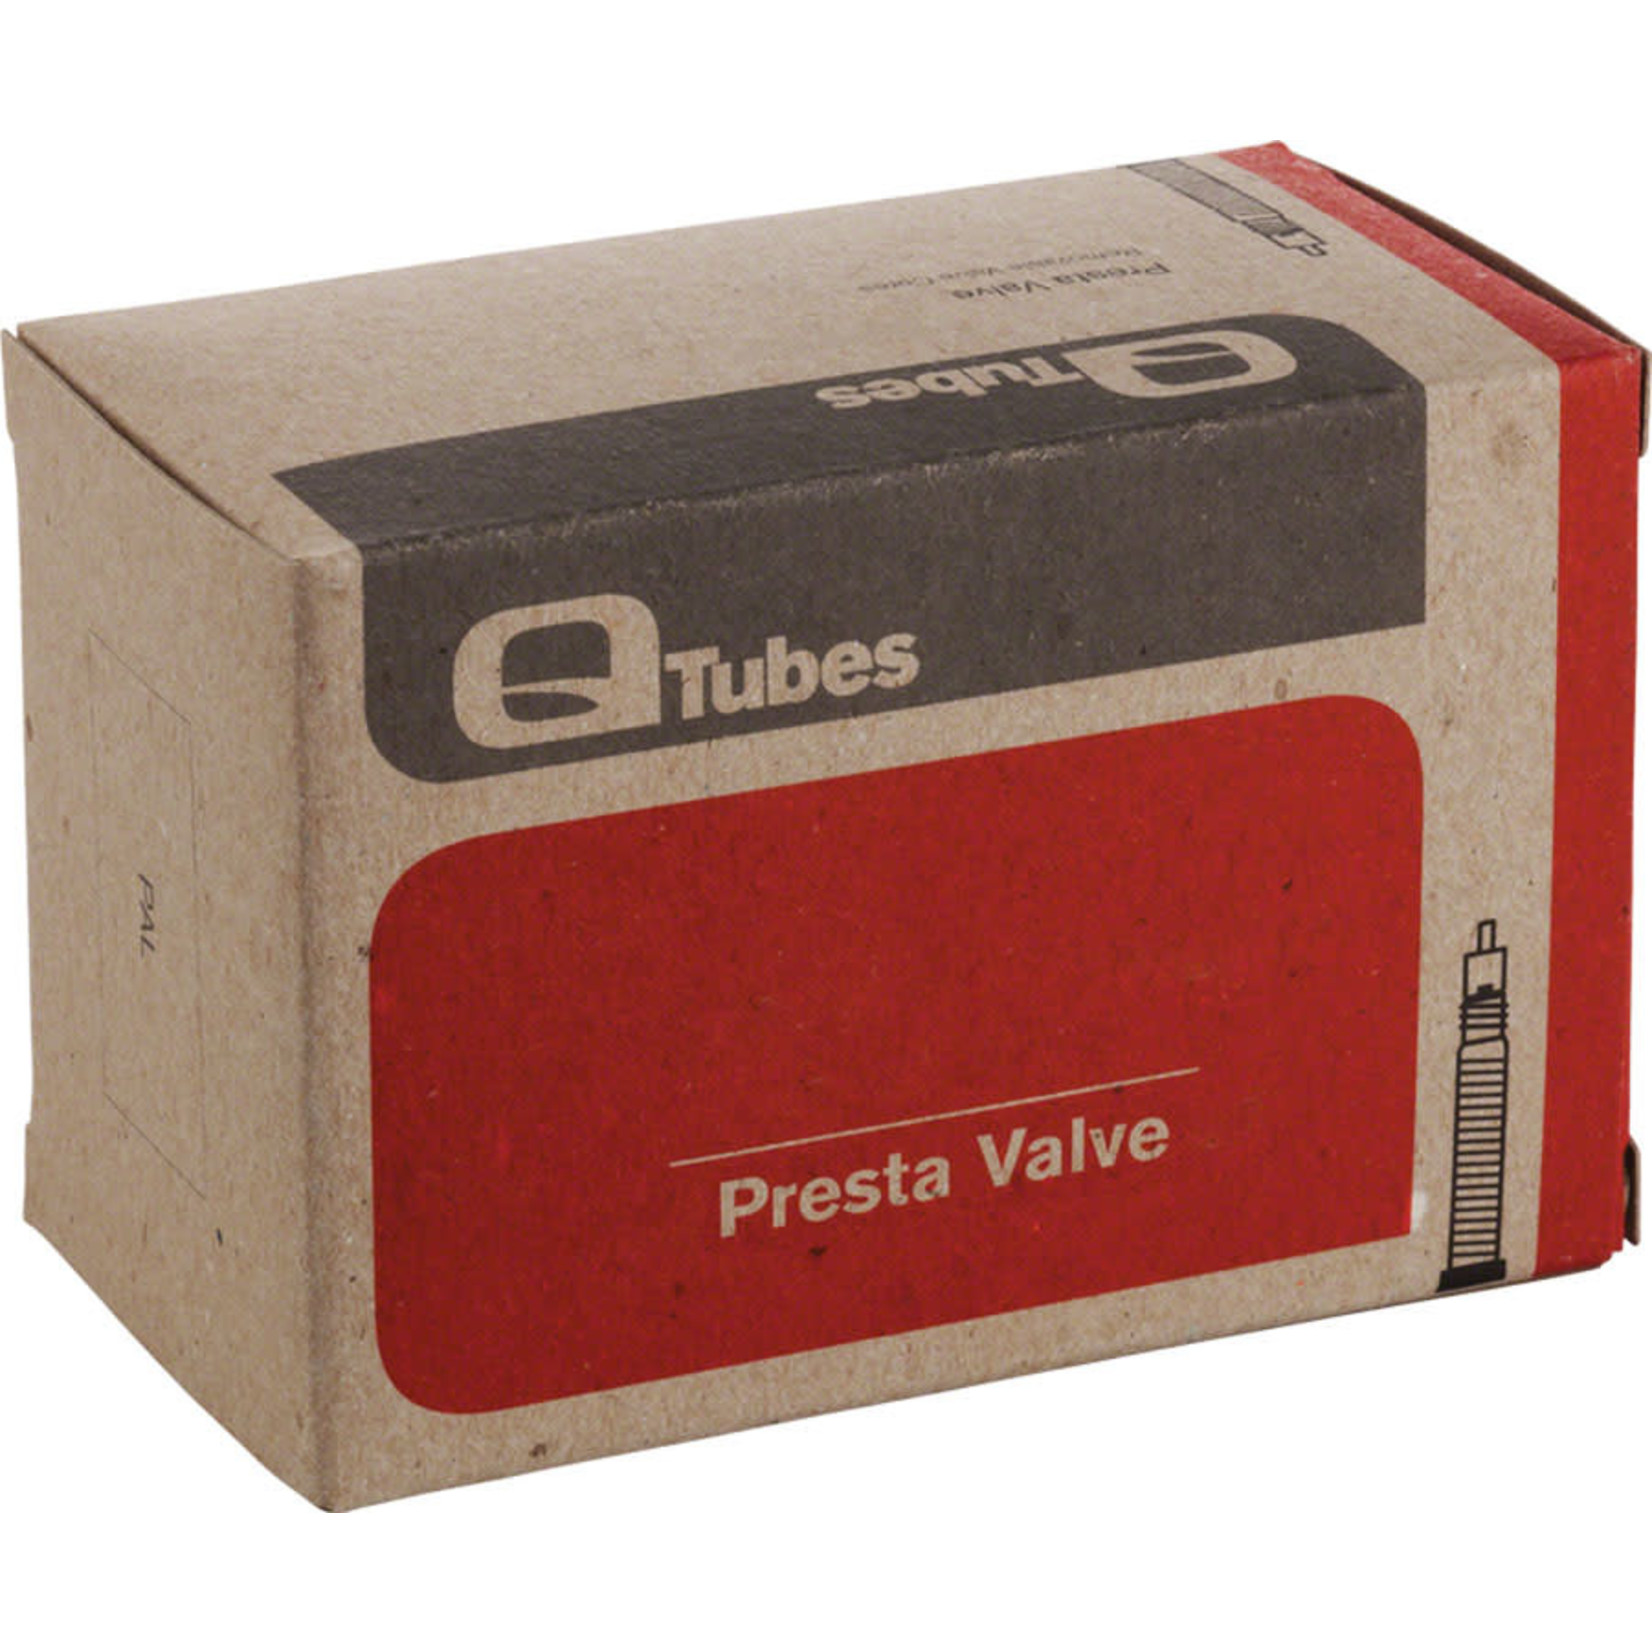 Q-Tubes Q-Tubes 27.5 x 2.0-2.25 48mm PV Tube